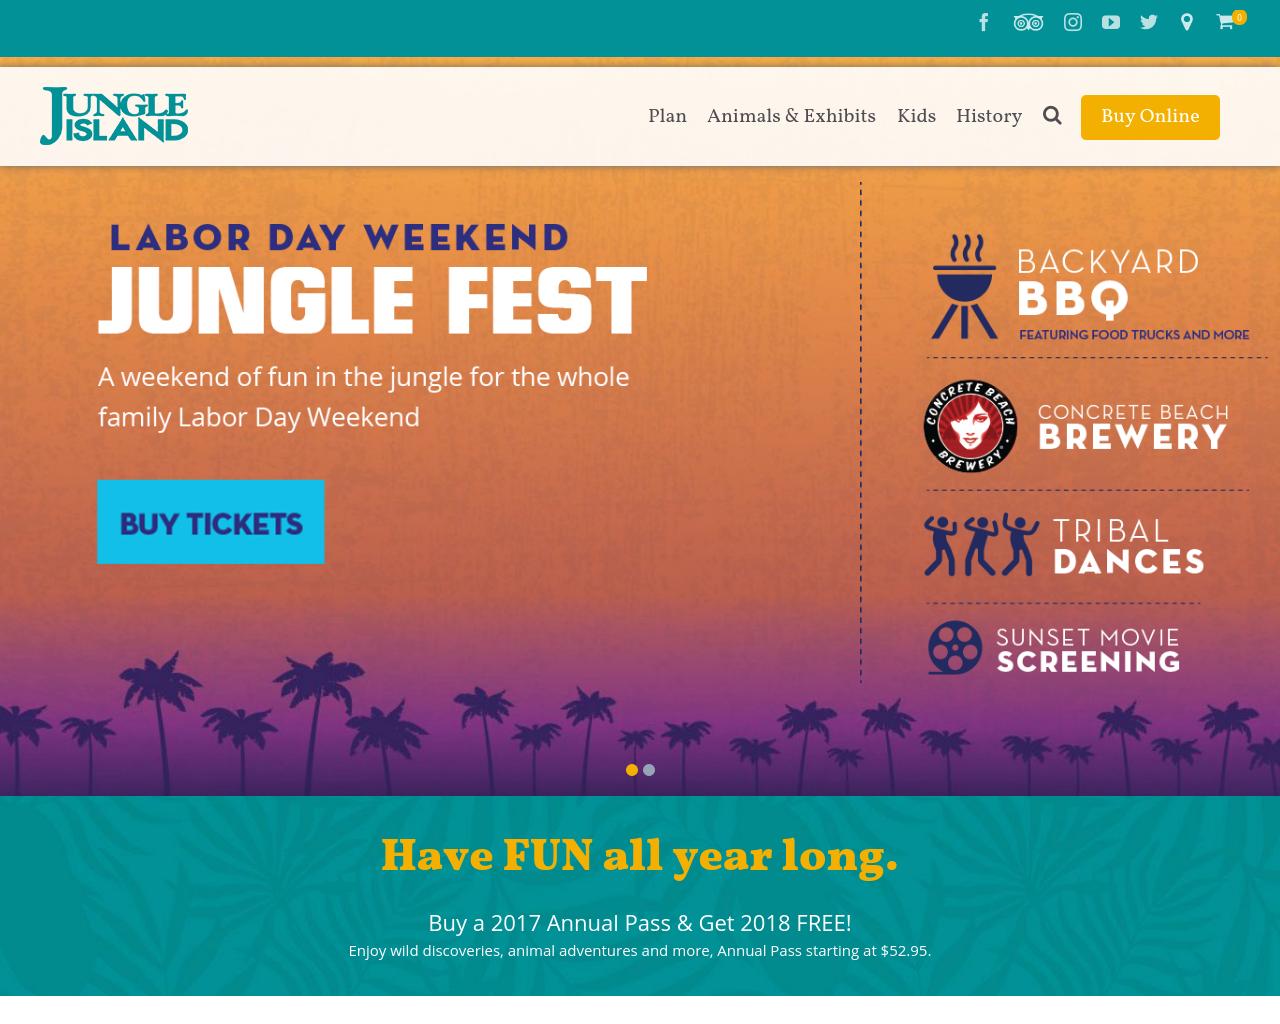 Jungle-Island-Advertising-Reviews-Pricing